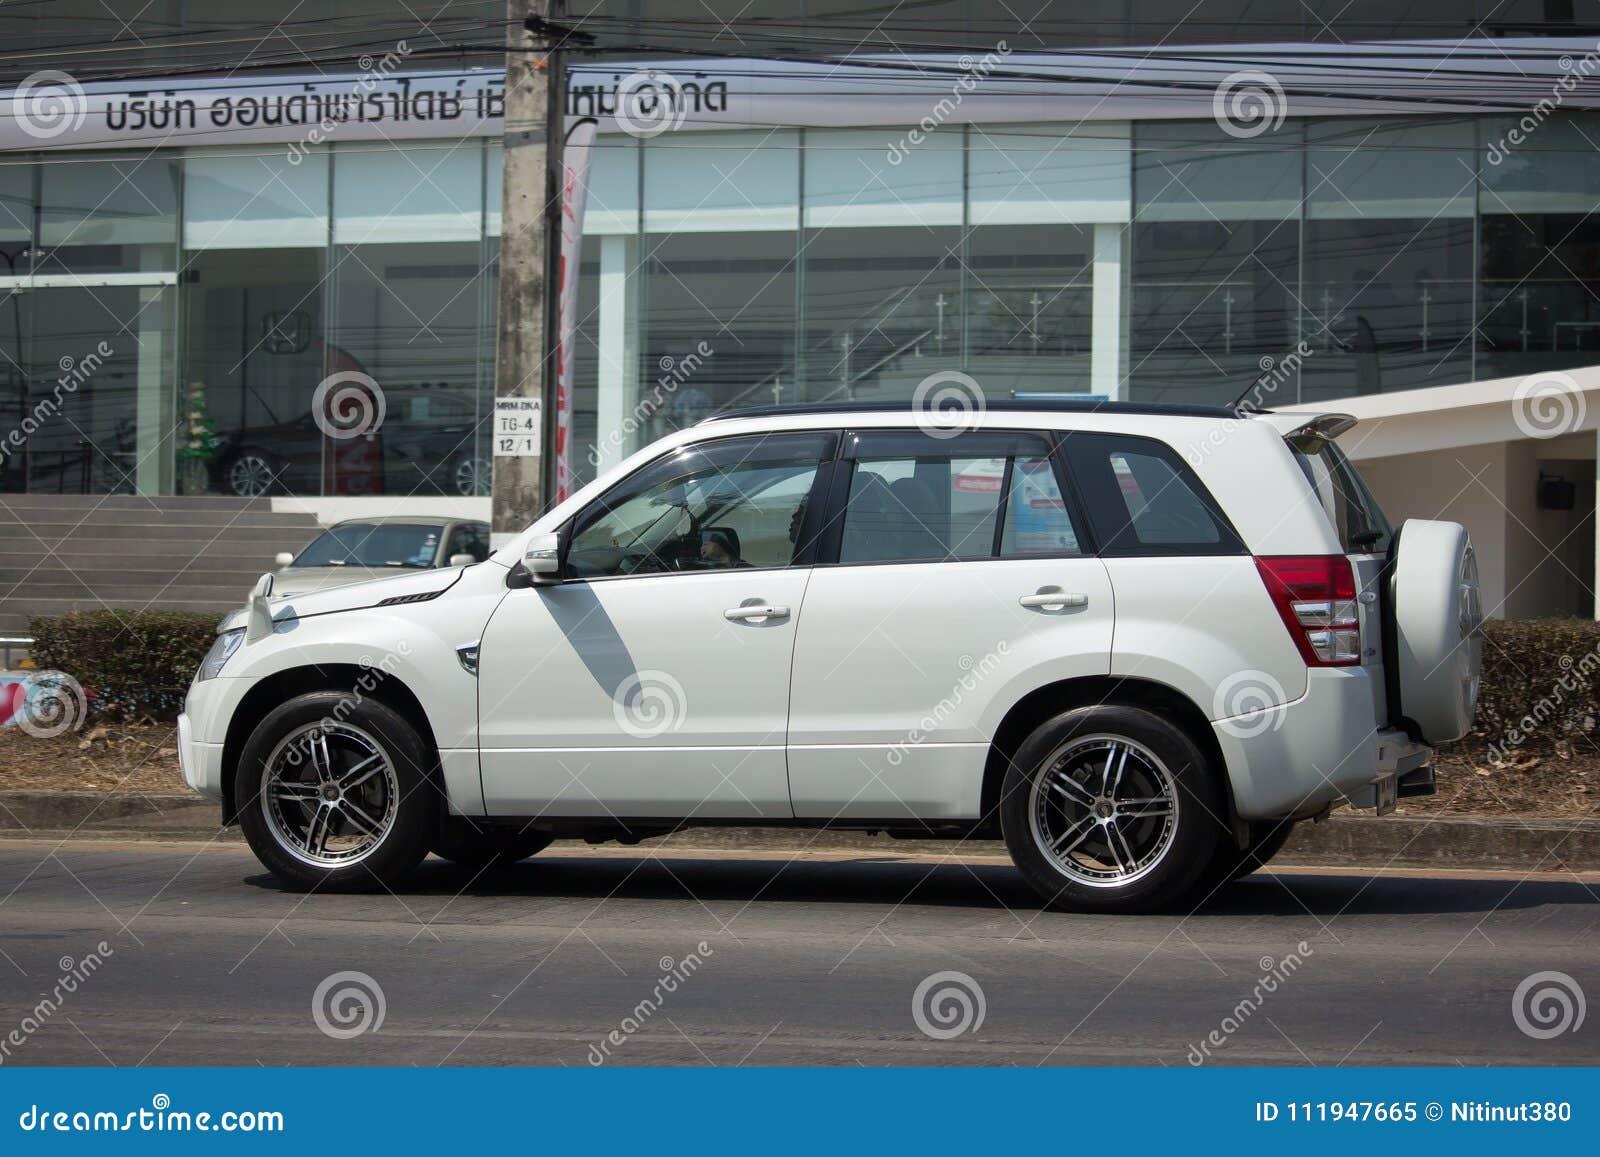 2020 Suzuki Grand Vitara Preview Review and Release date